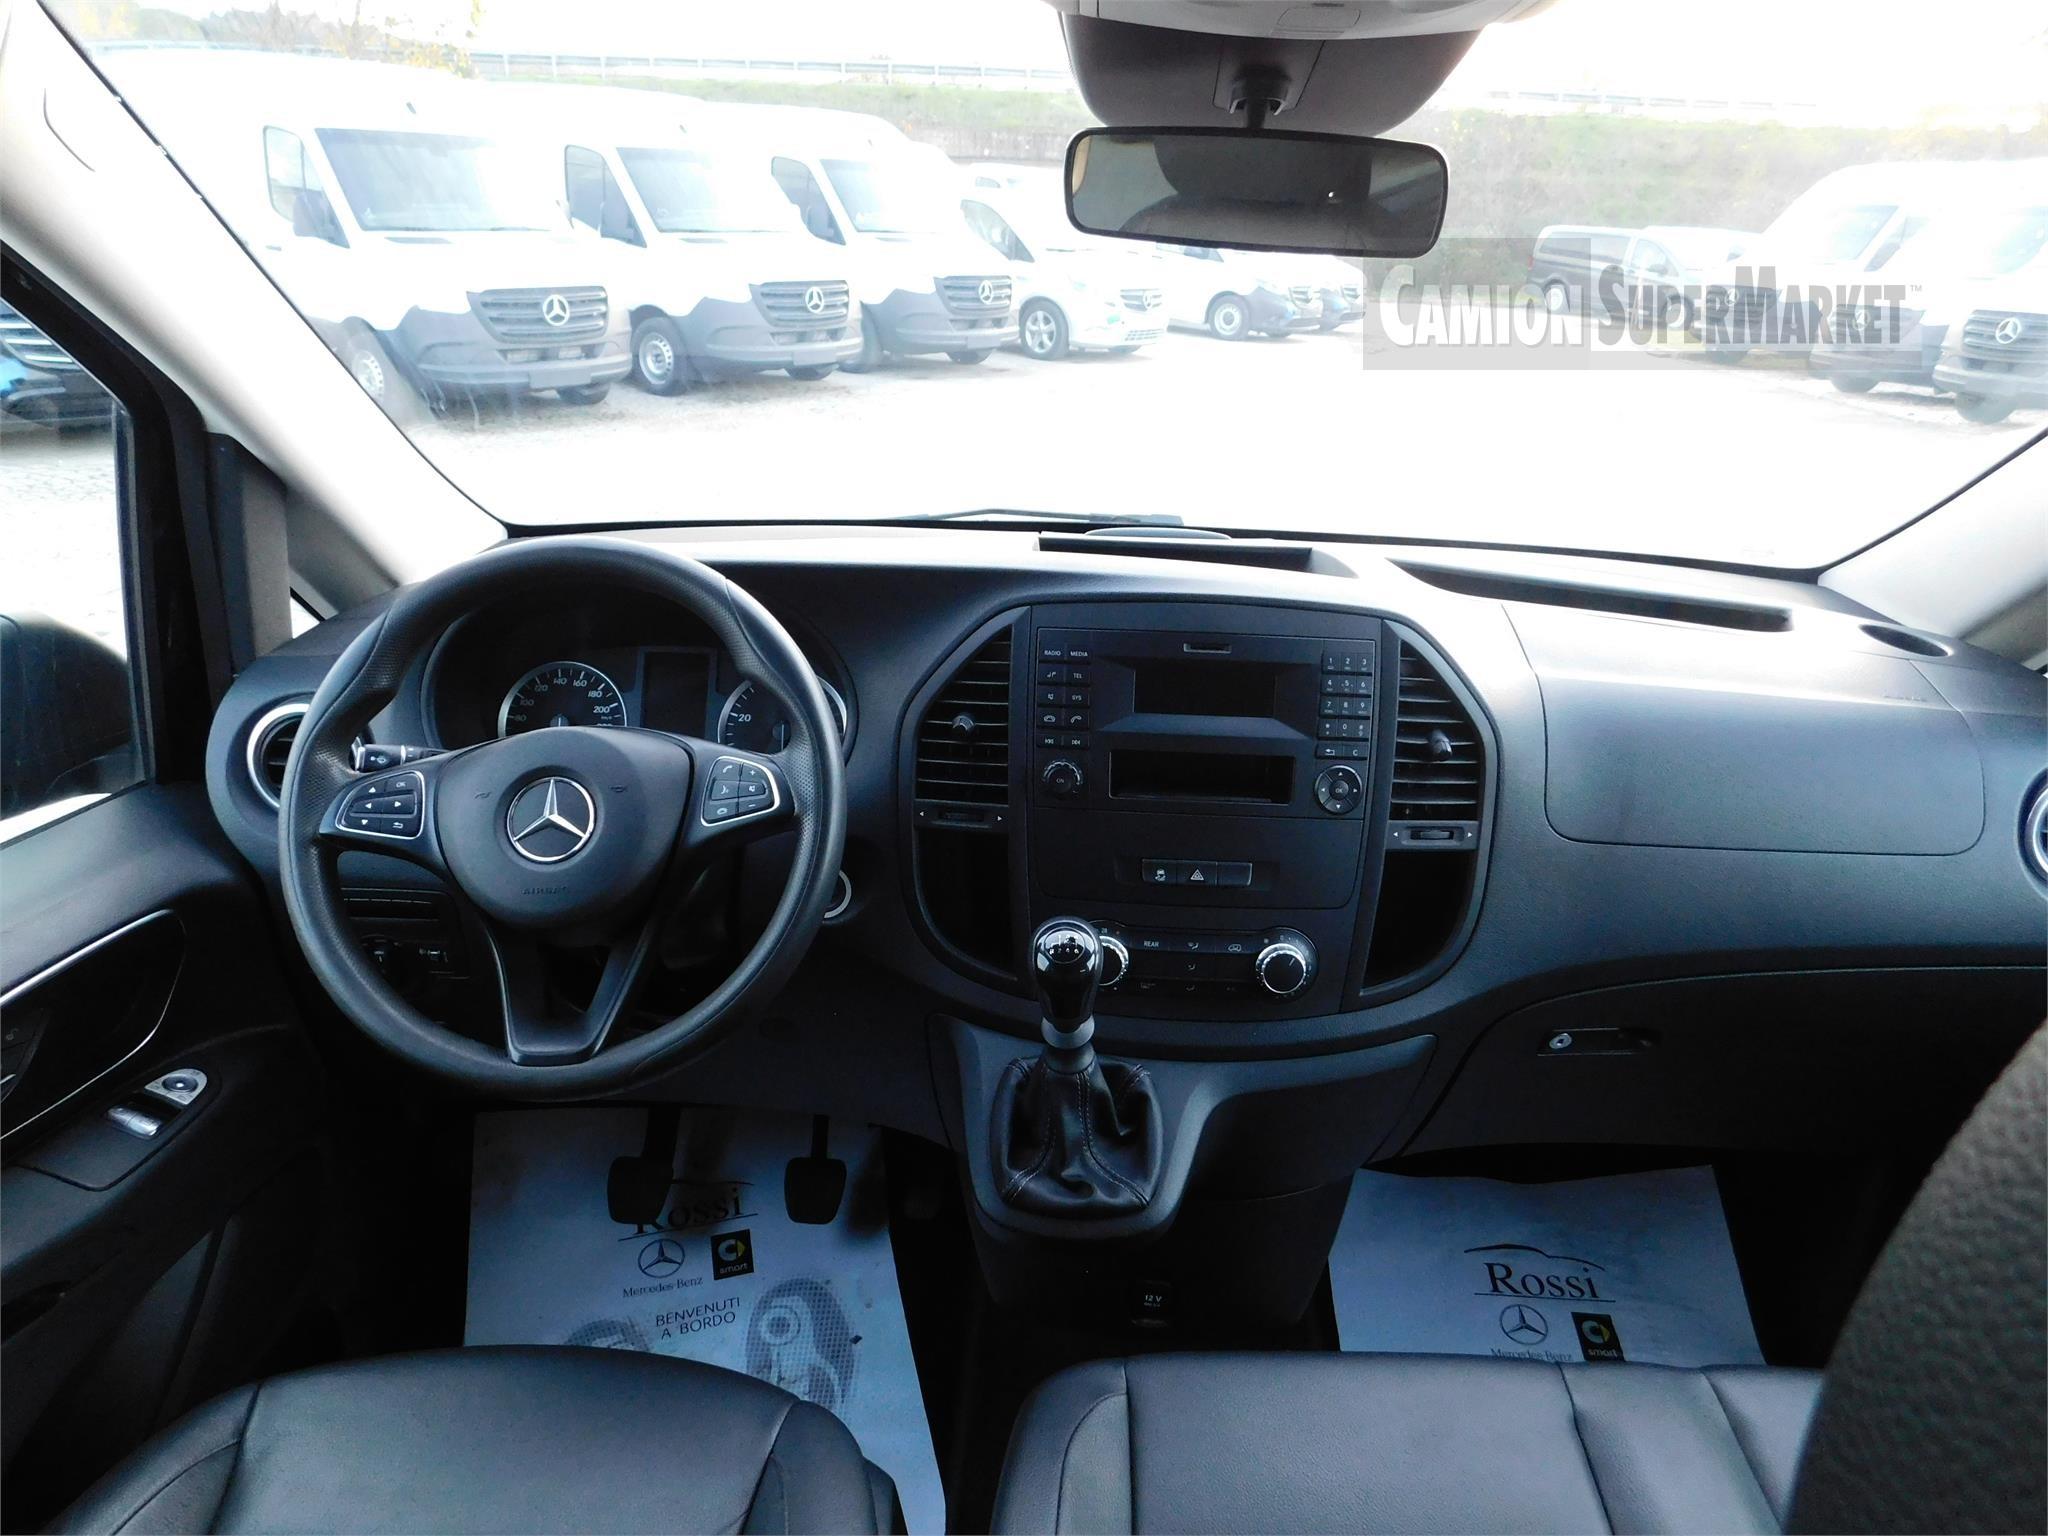 Mercedes-Benz VITO 116 Usato 2017 Umbria